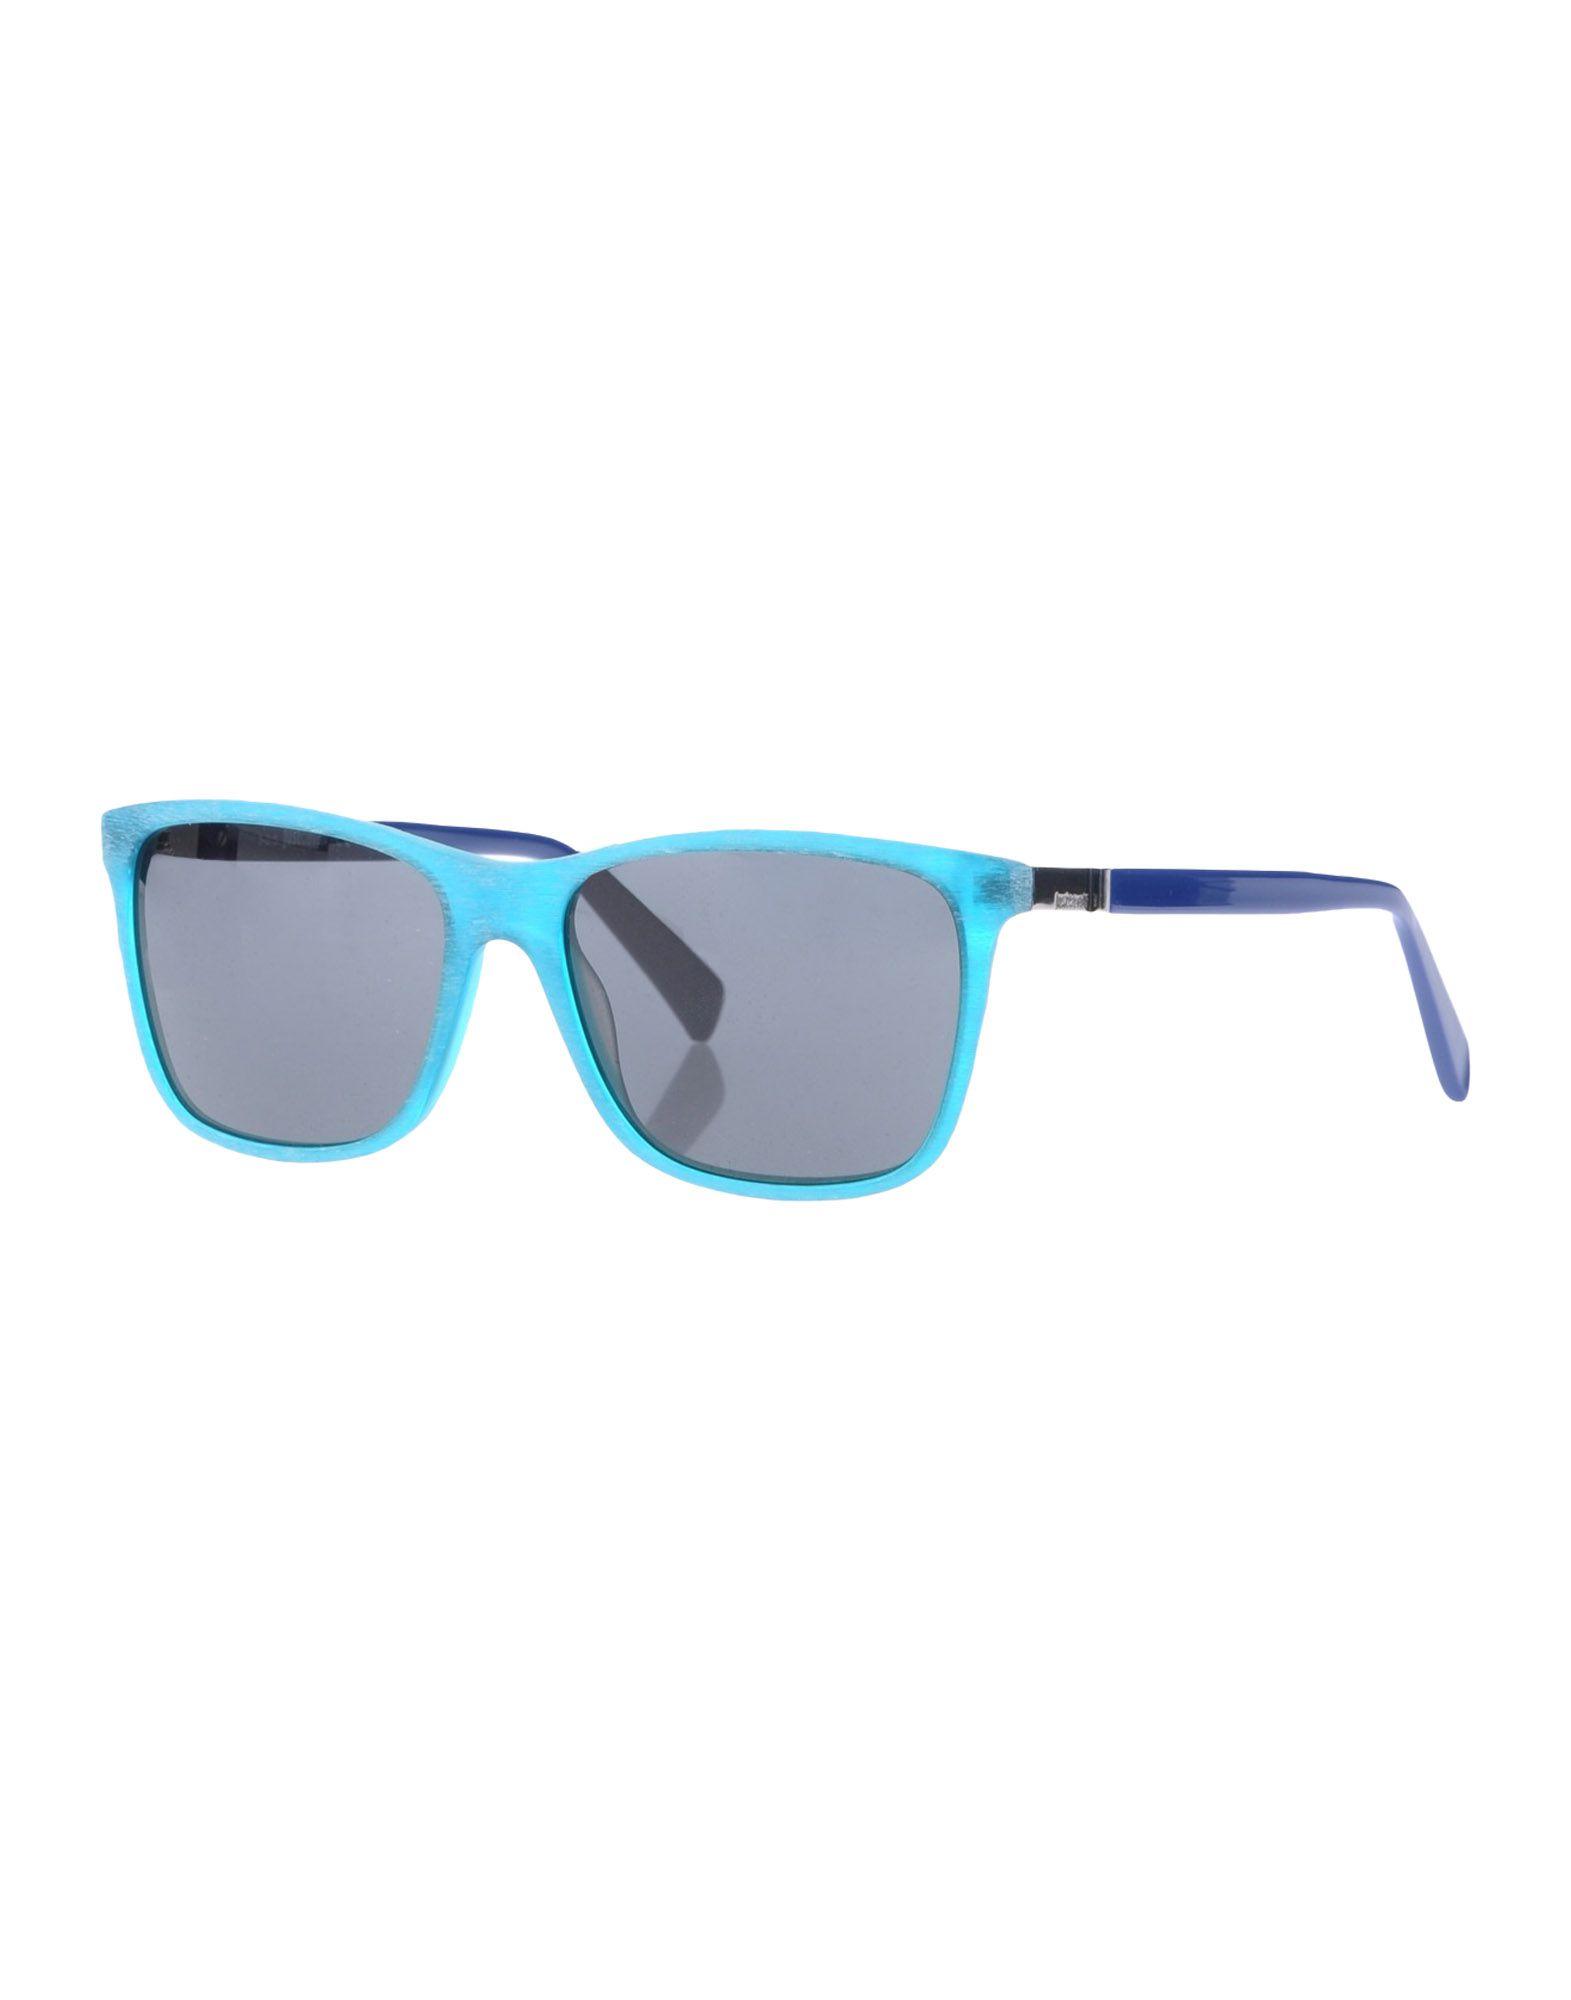 JUST CAVALLI EYEWEAR Солнечные очки